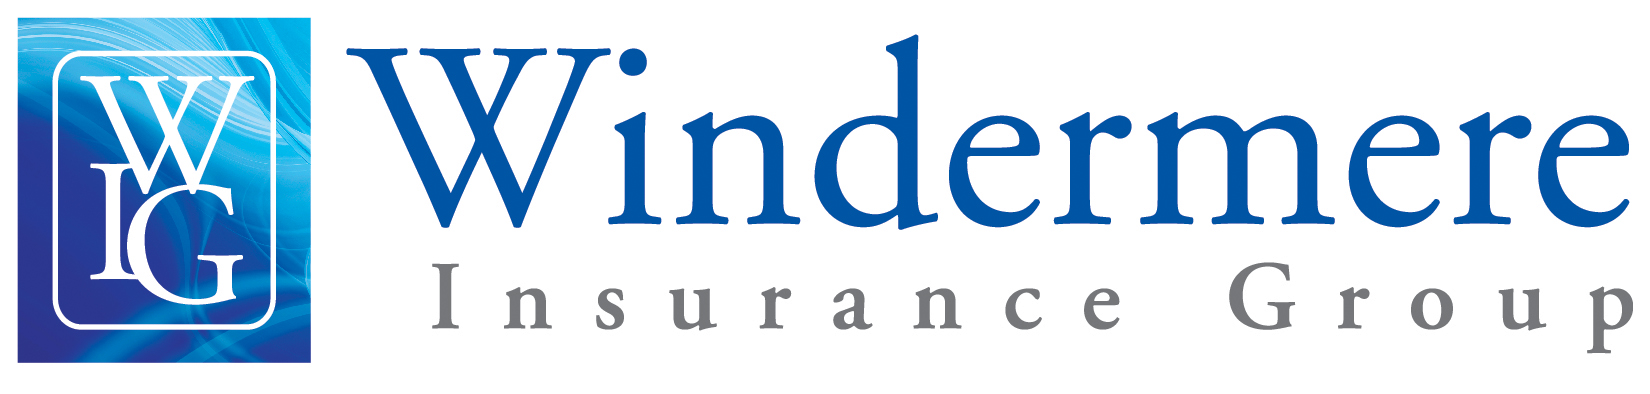 Windermere Insurance